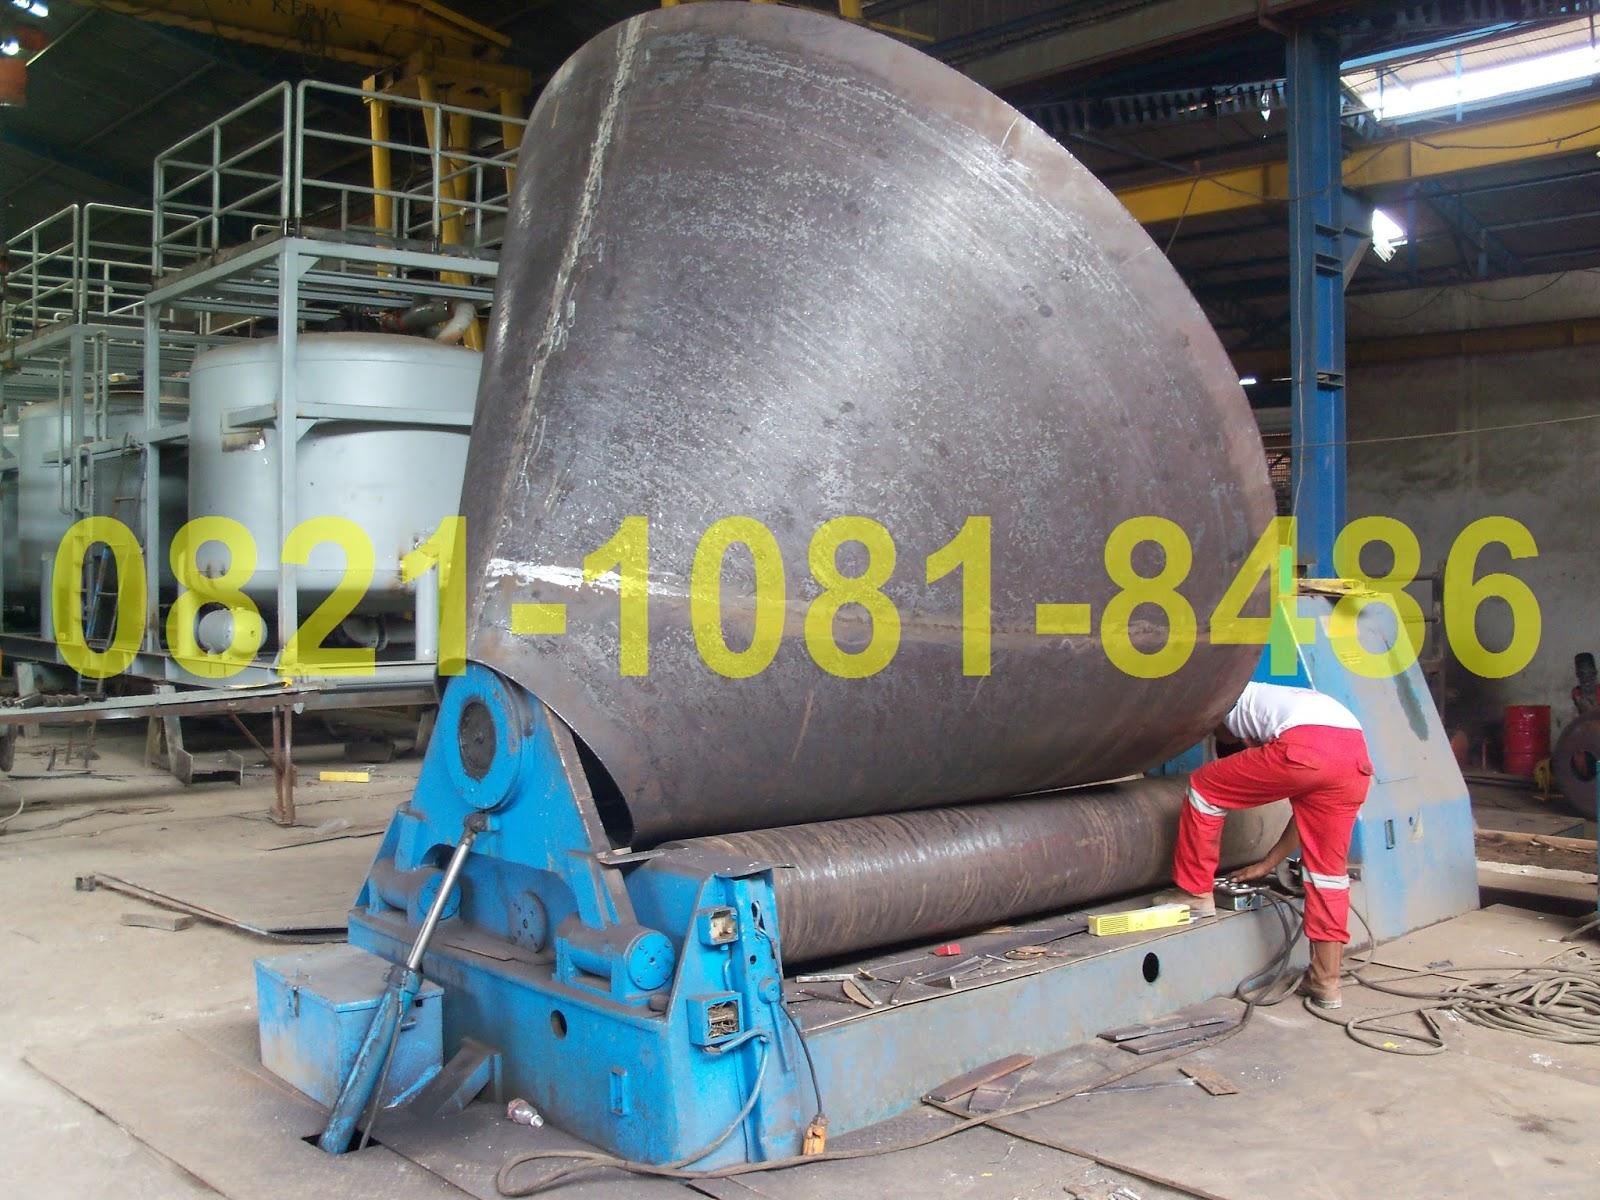 Jasa Fabrikasi Dust Collector Trolley Alat Berat Elektrik Krisbow 1t Kw0501625 Proses Roll Cone